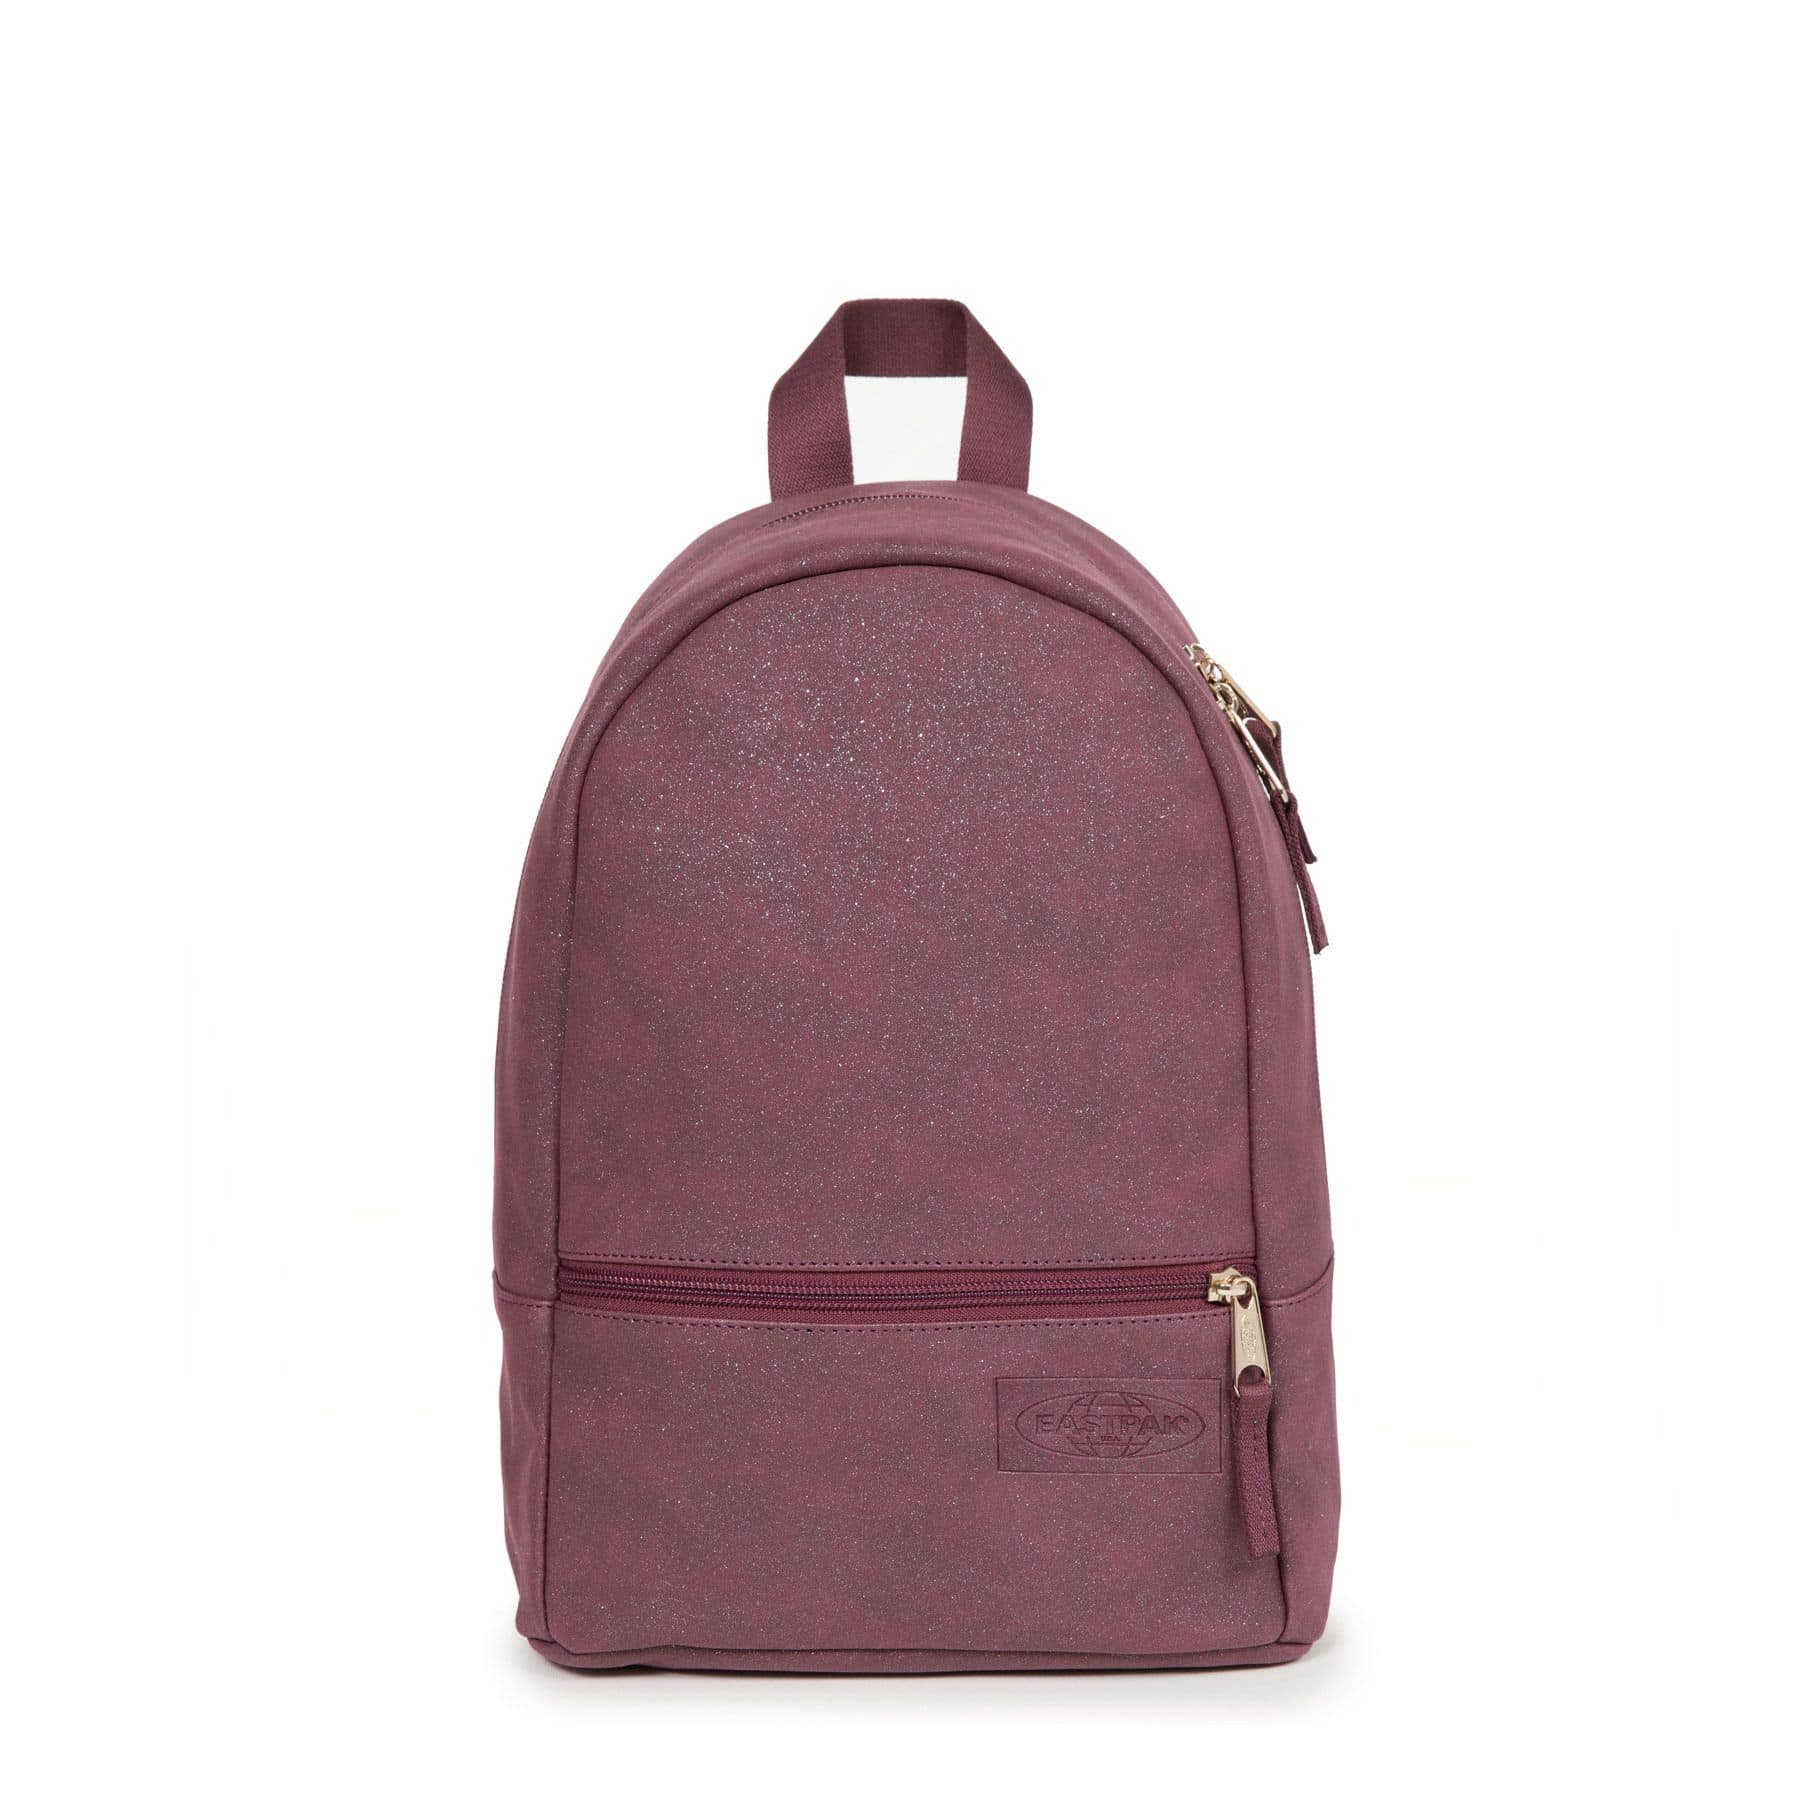 Eastpak Lucia Super Fashion Backpack Purple-0